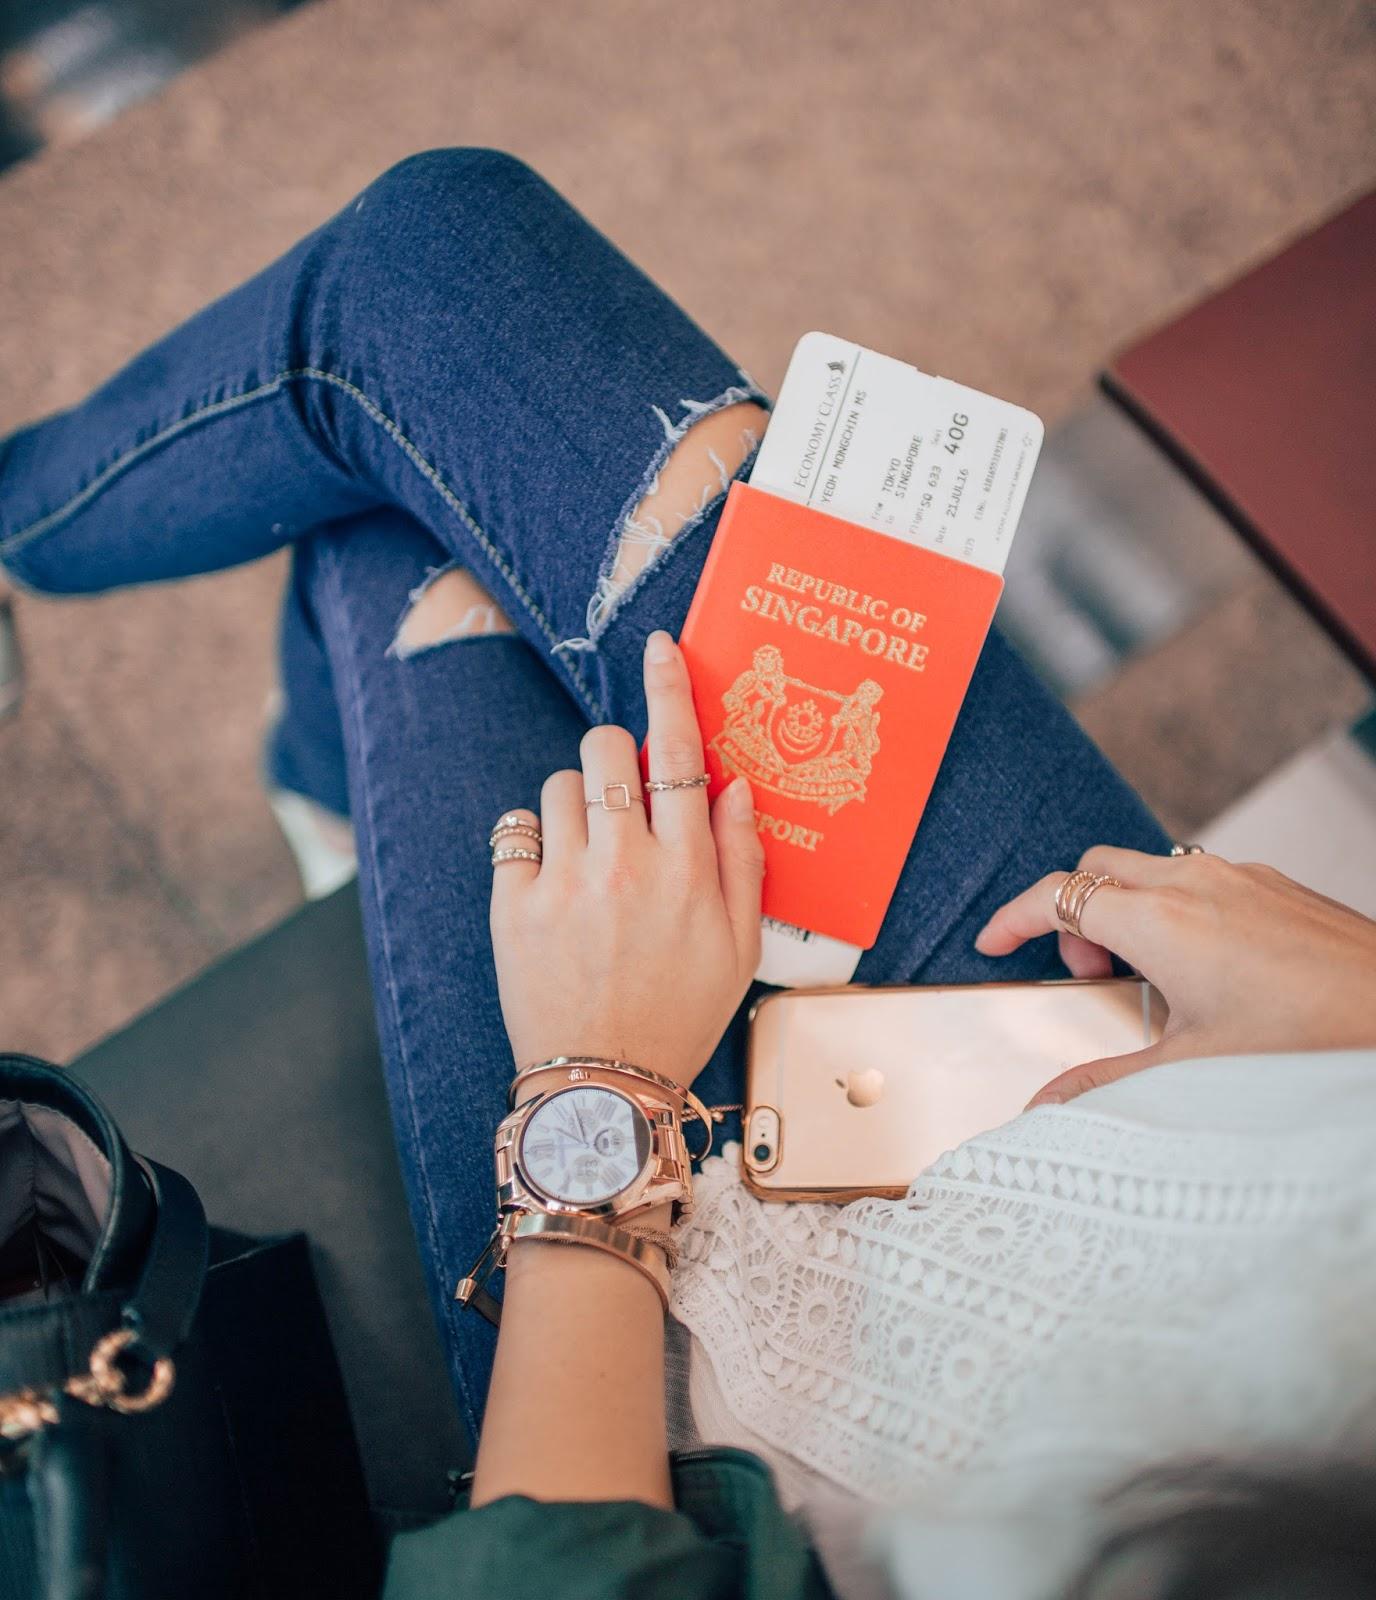 singapore, airport, watch, rosegold, michaelkors, review